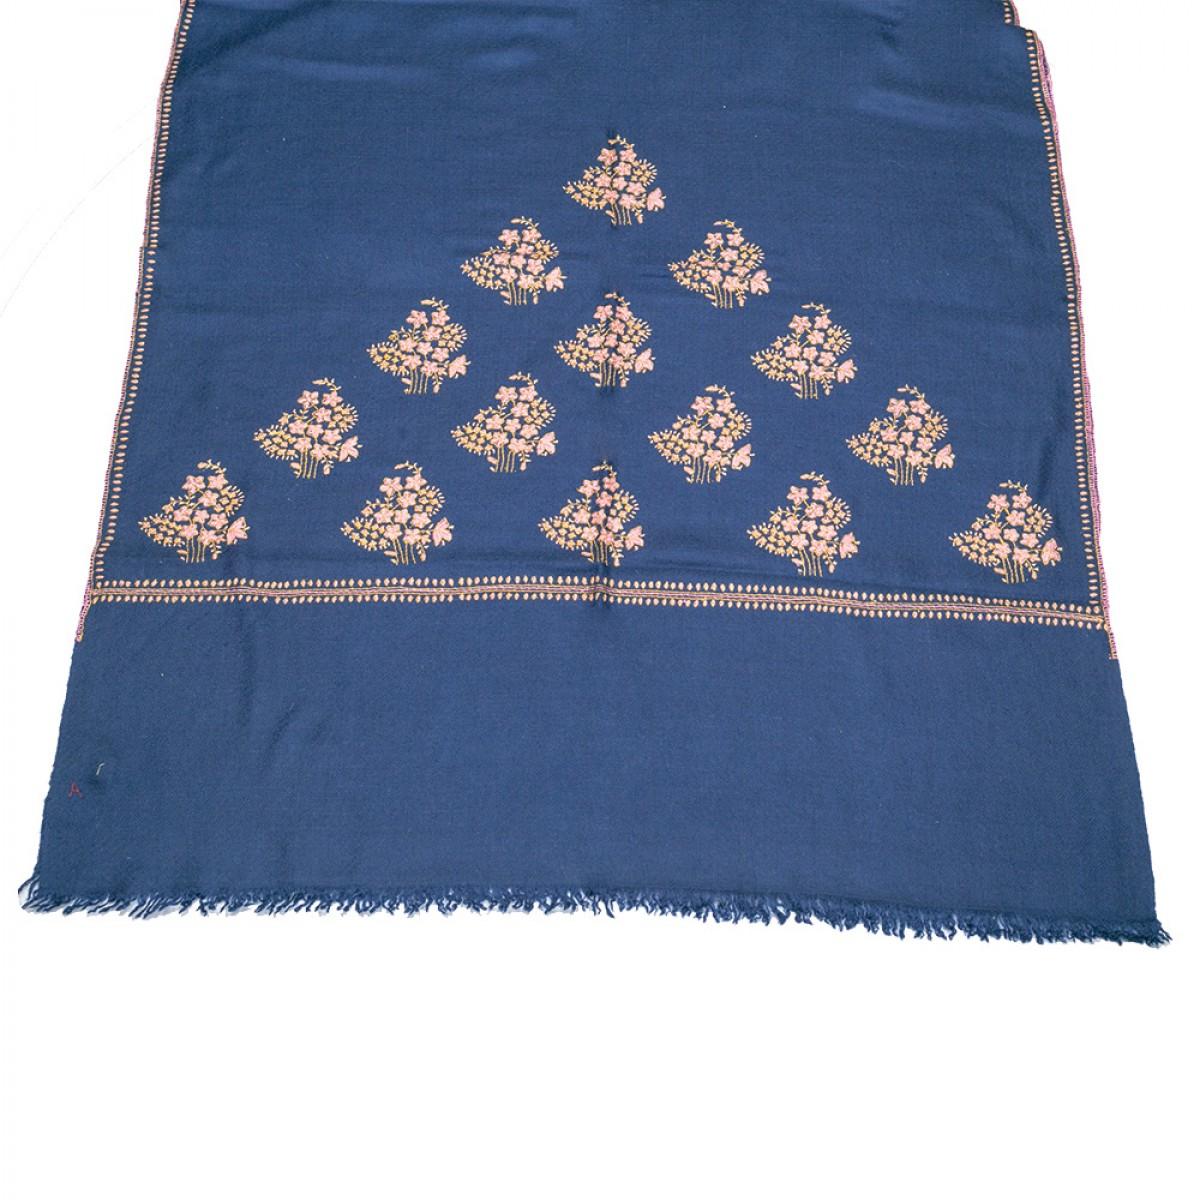 Embroidered Pashmina stole - Midnight Blue